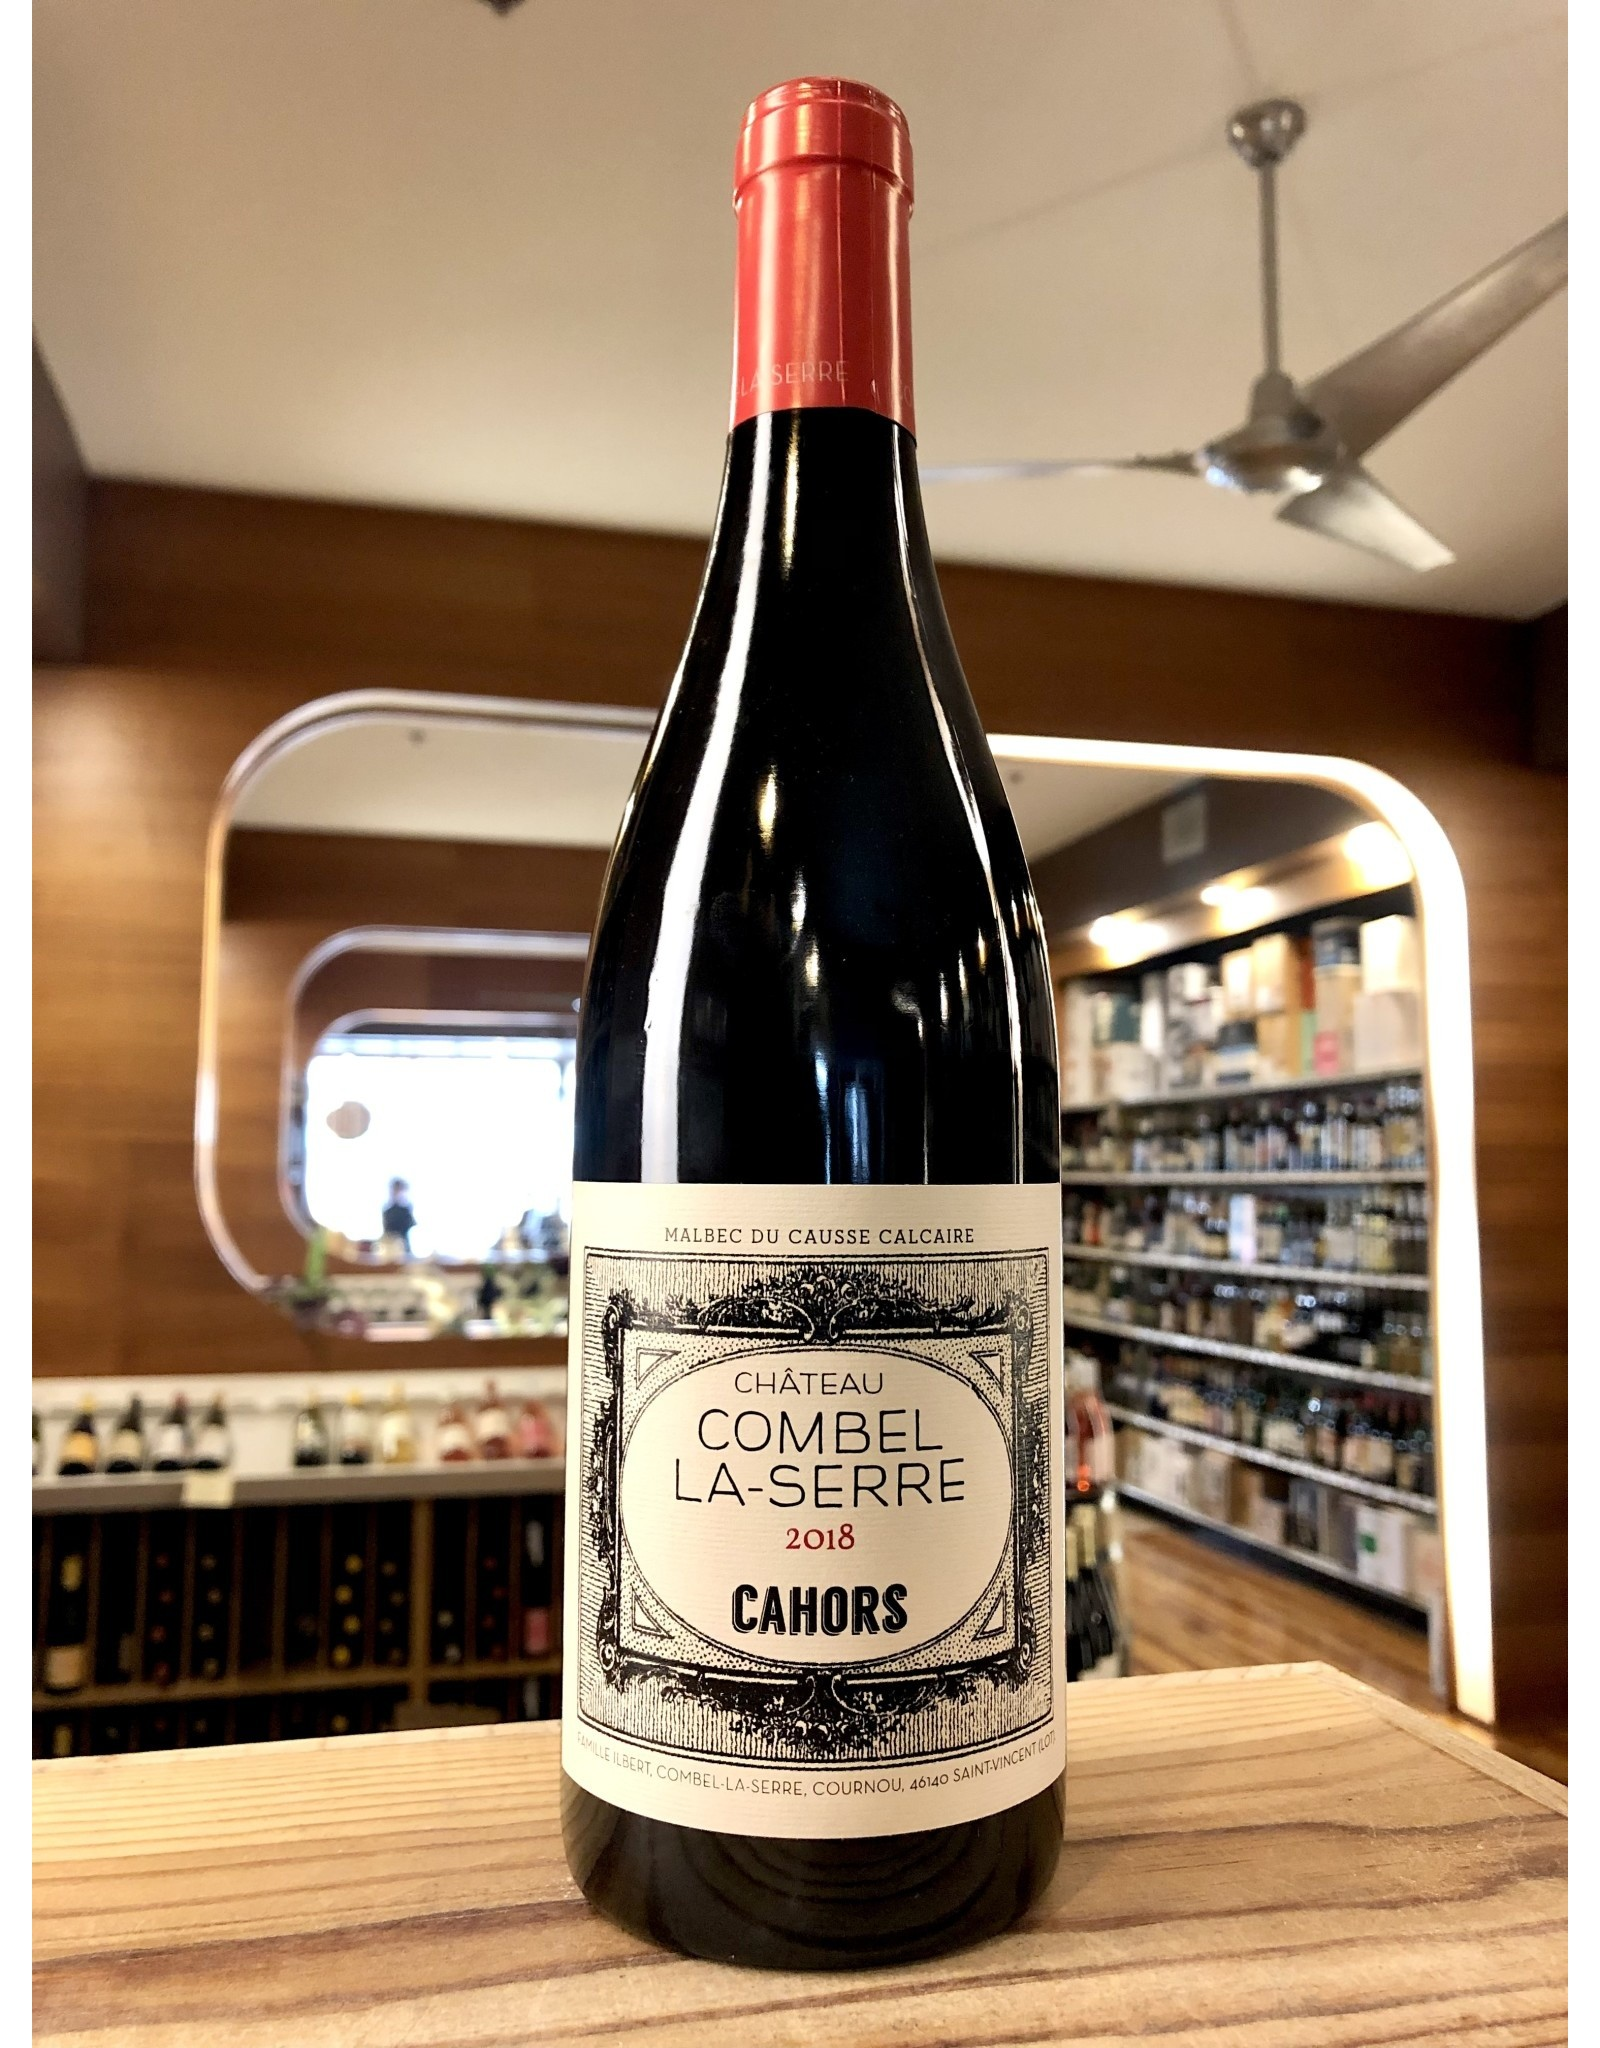 Chateau Combel-La-Serre Cahors 2018 - 750 ML